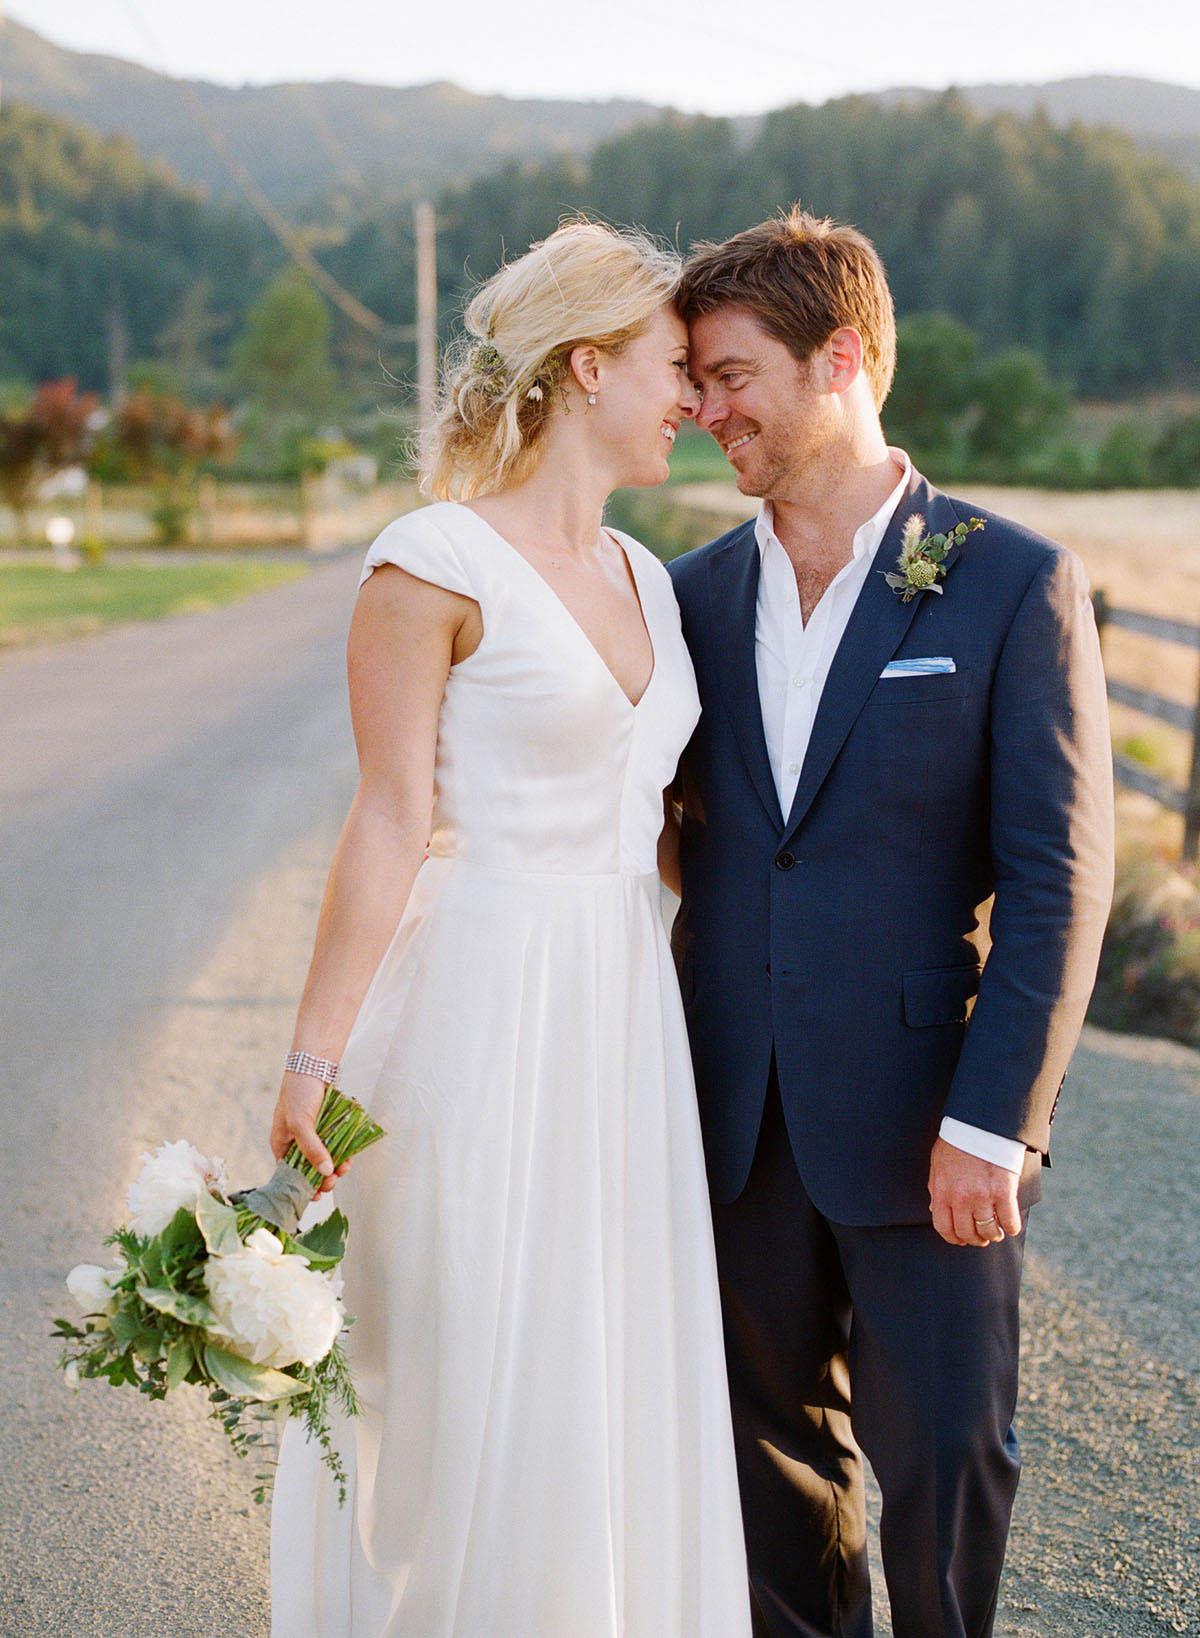 40-bride-groom-foreheads-together.jpg